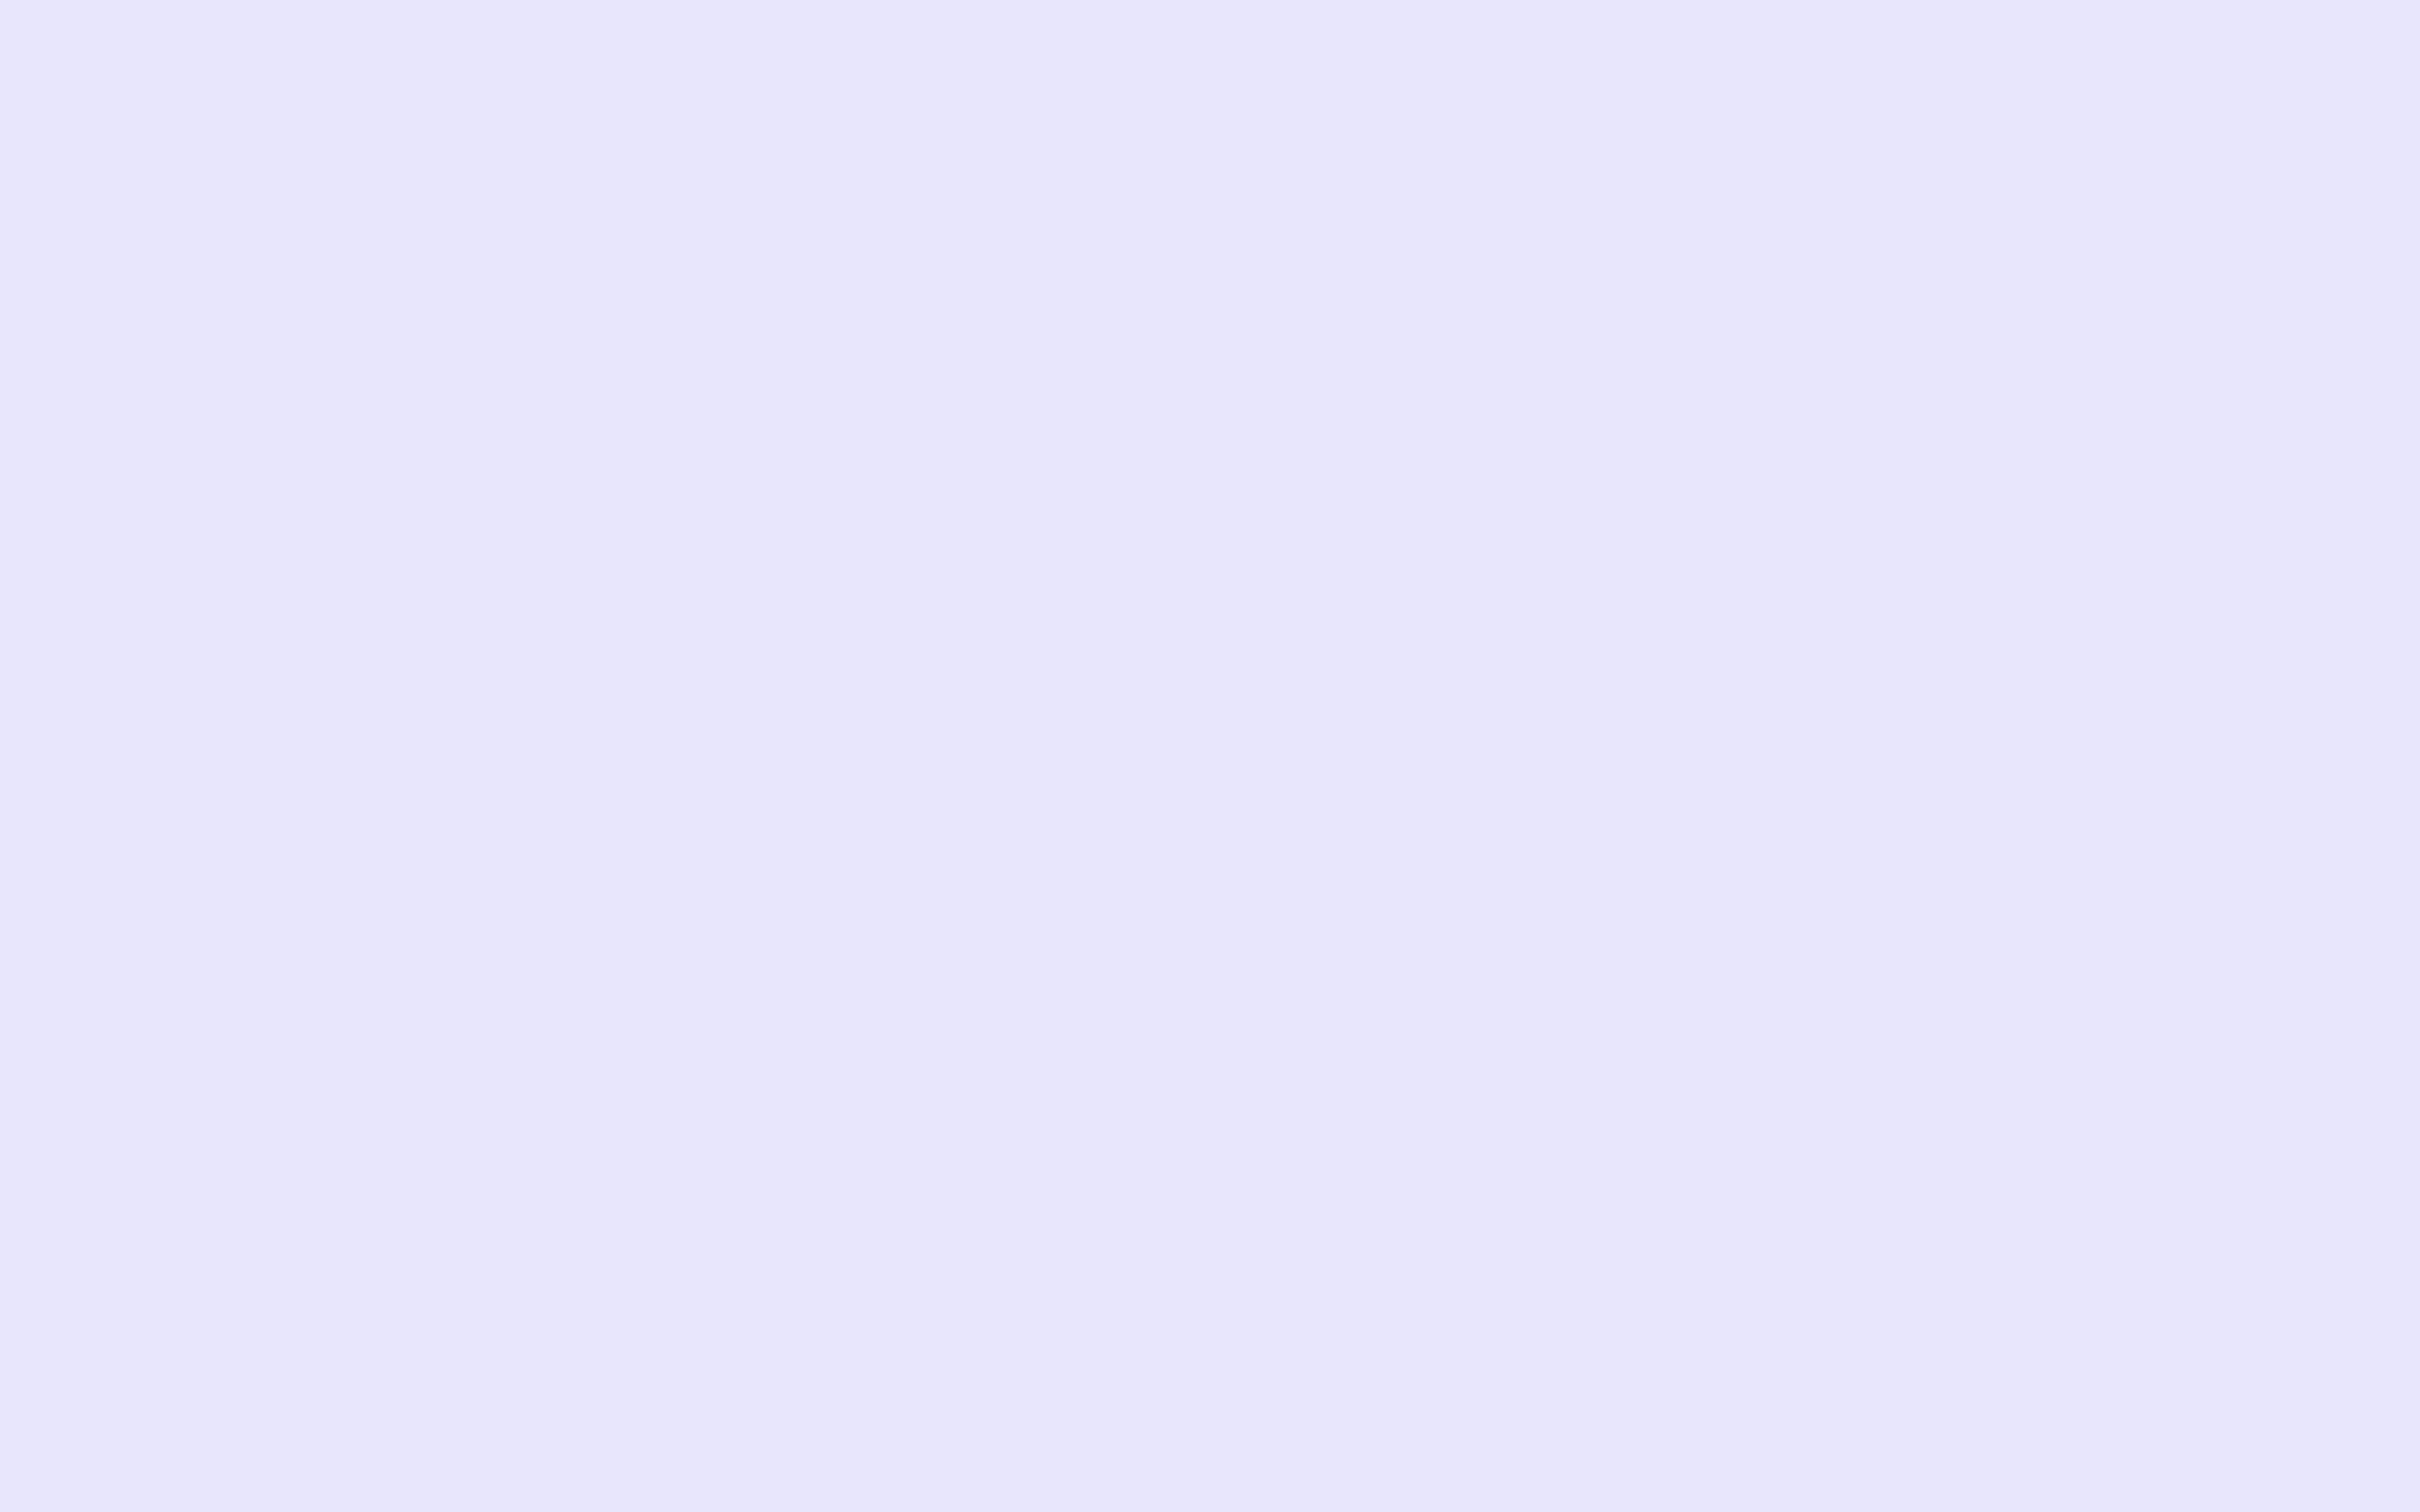 2560x1600 Lavender Web Solid Color Background